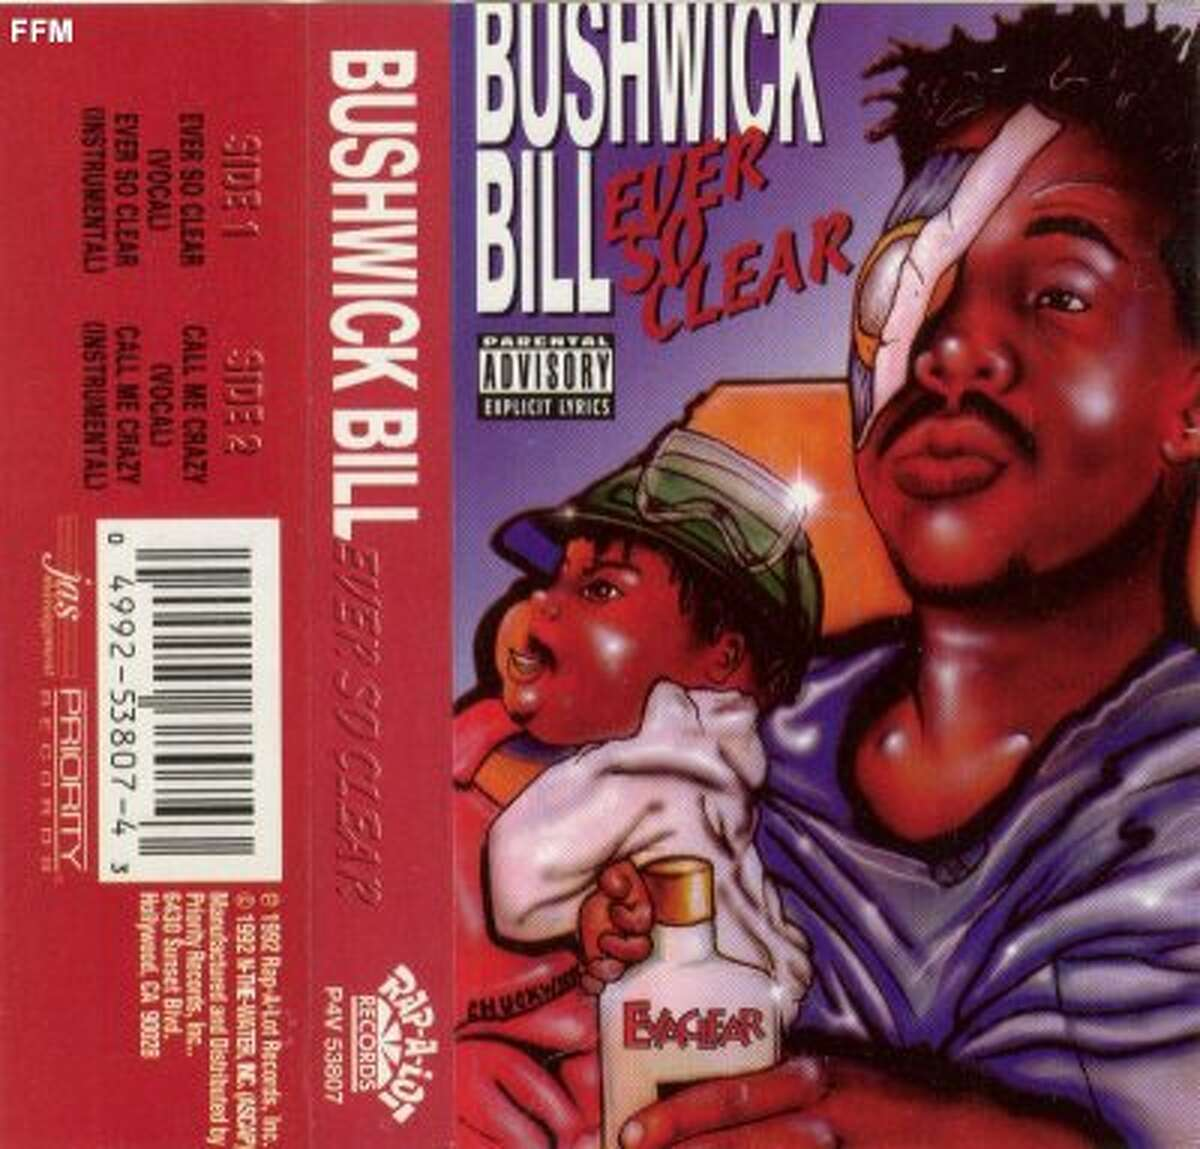 Bushwick Bill - Ever So Clear *tape single*. 1992, Rap-A-Lot RecordsHouston, Texas